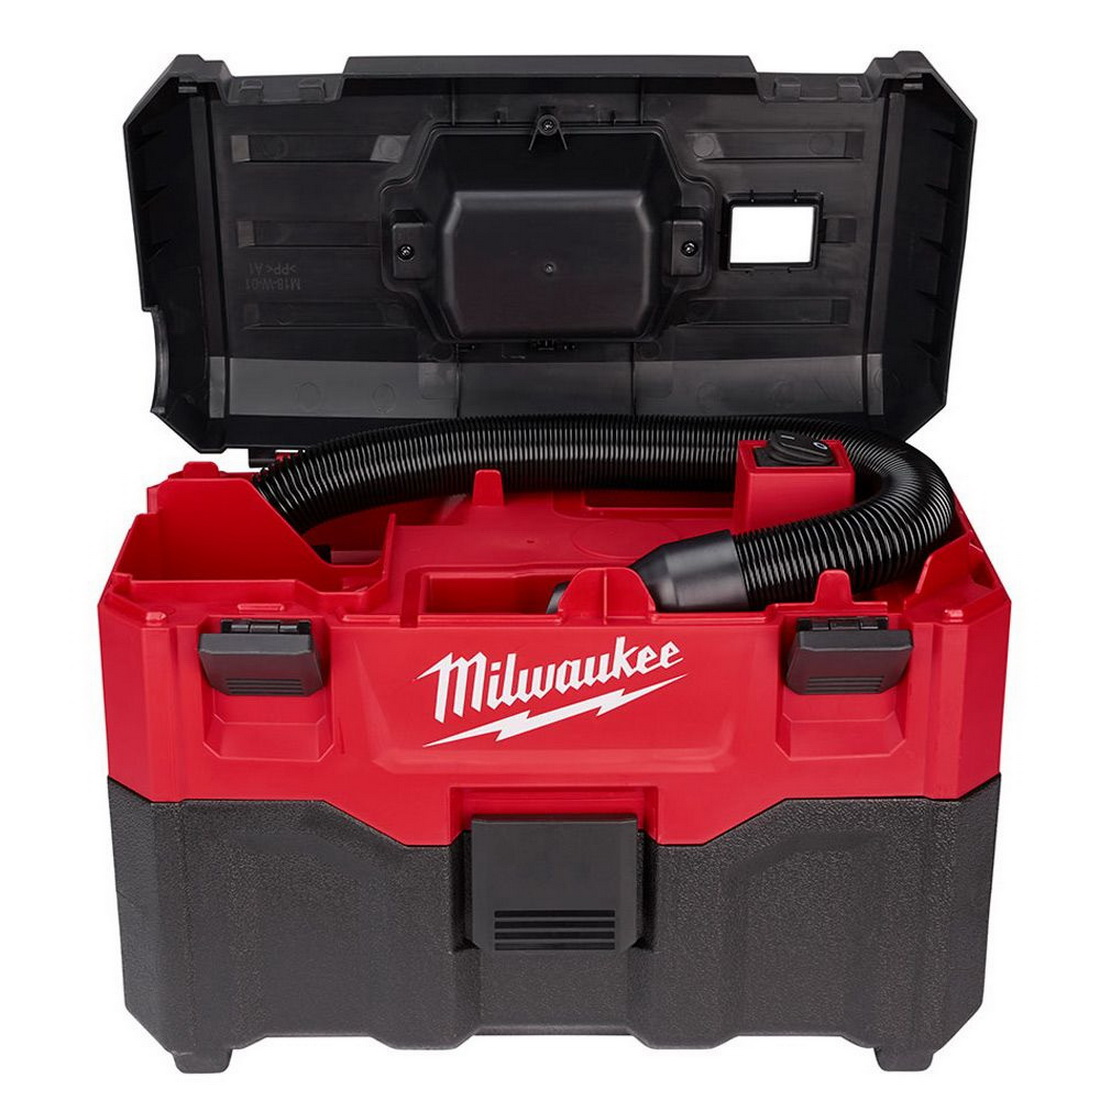 M18 Wet/Dry Vacuum (Tool Only) 7.5 Litre M18WDV-0